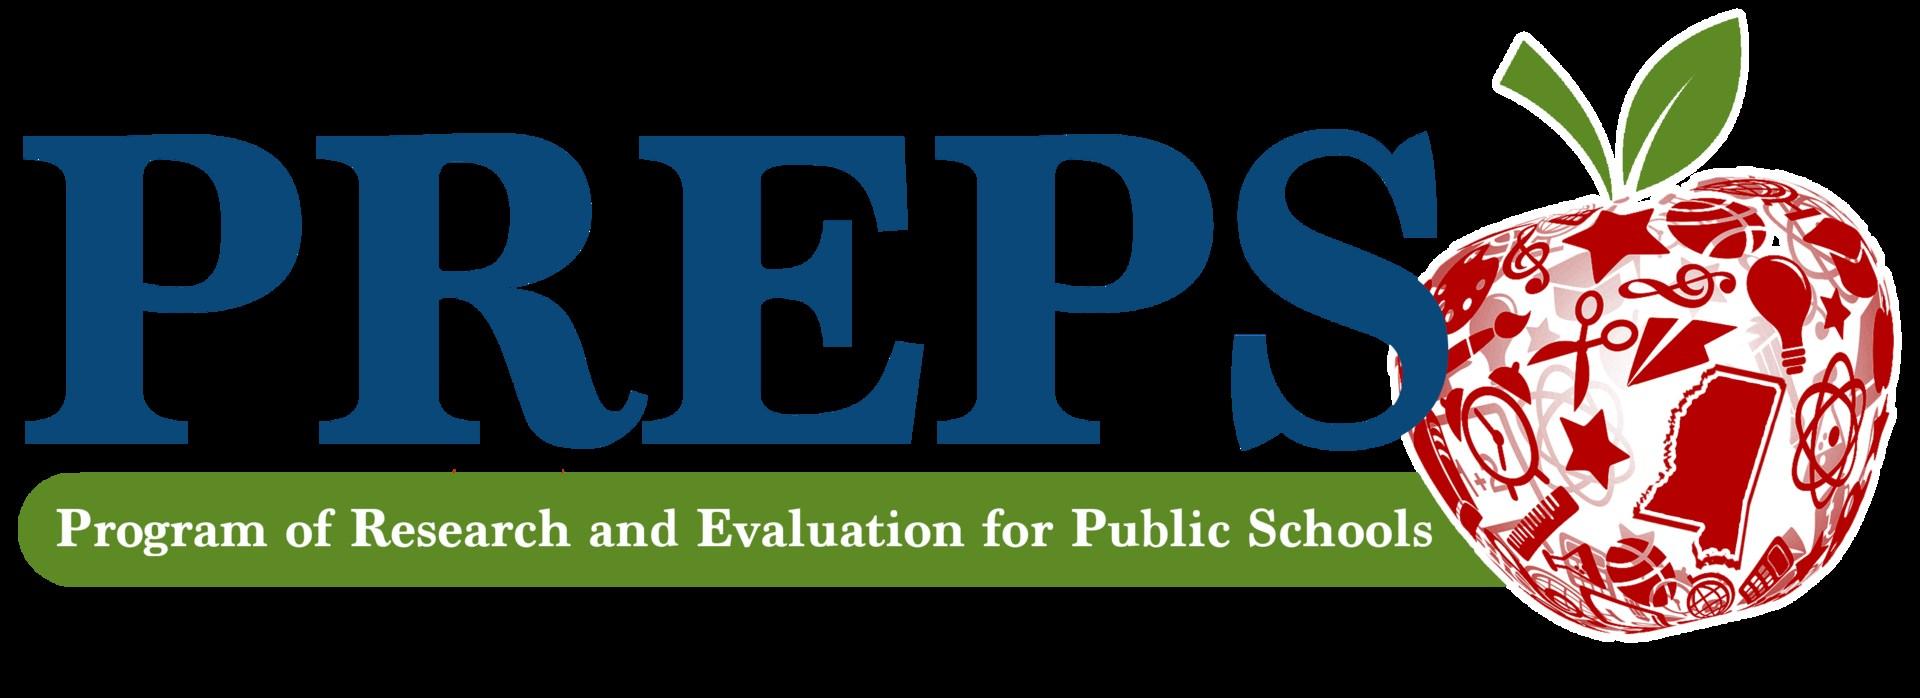 PREPS Logo